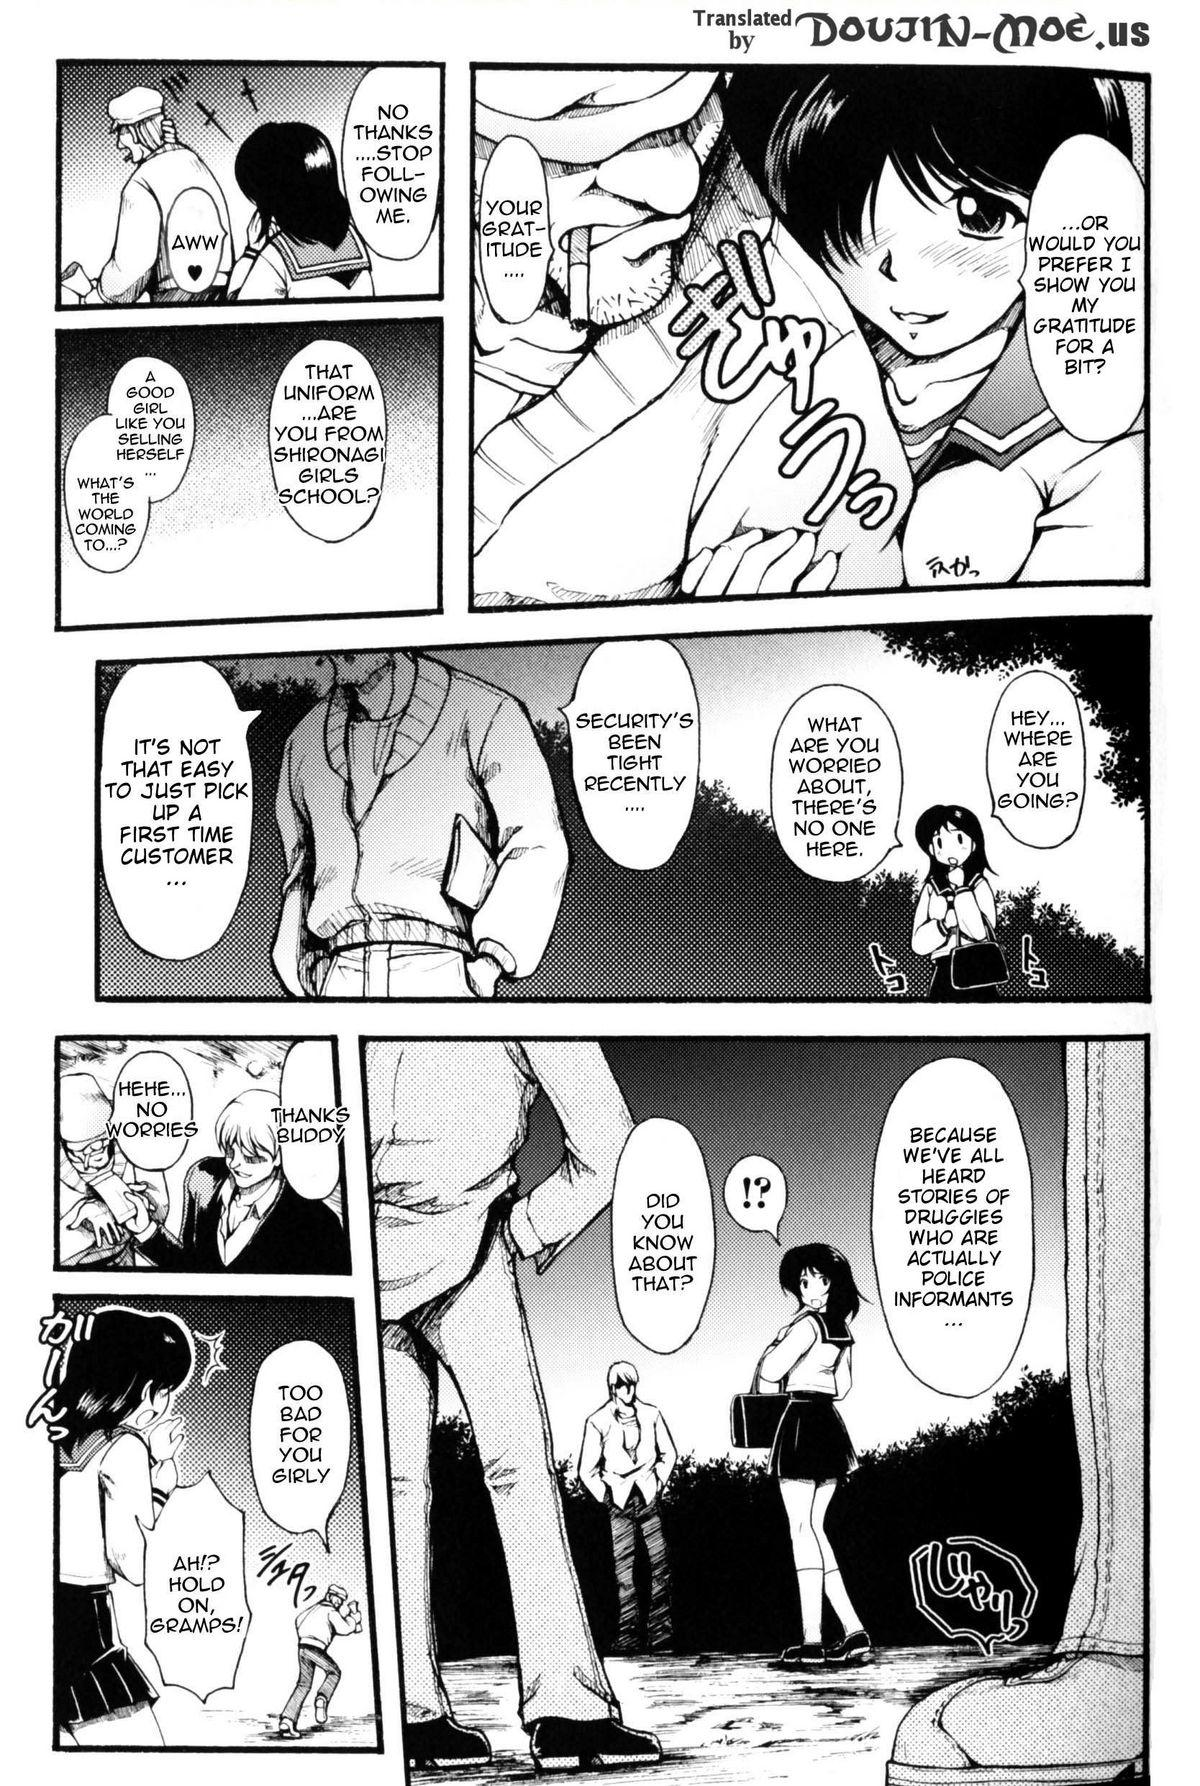 Itzuka-san's Case File 2